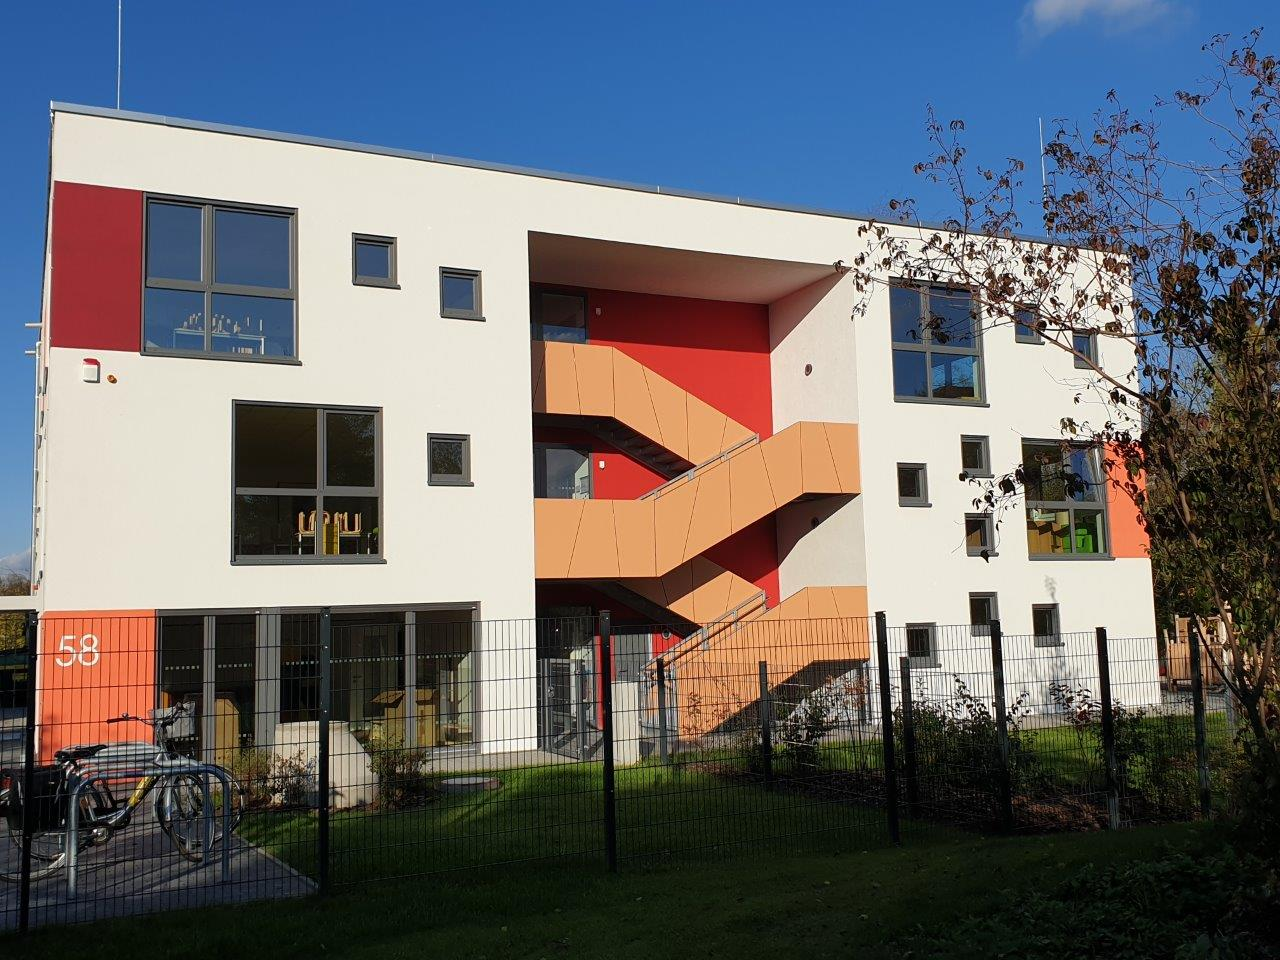 Fassade der Kindertagesstätte